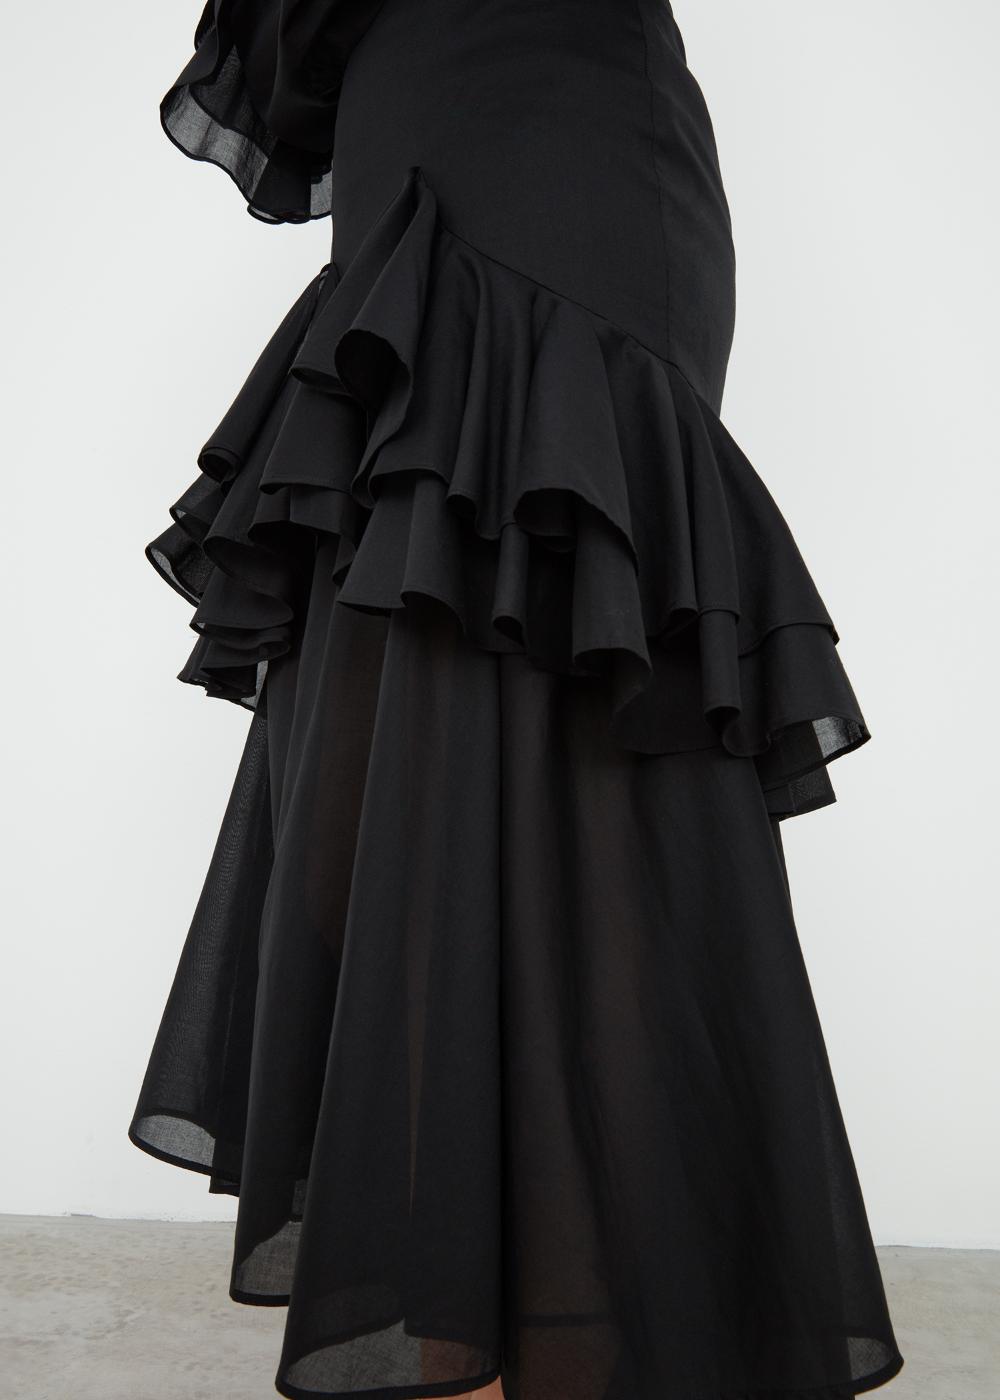 Dresses Skirts Dresses Dress Skirt Skirts [ 1400 x 1000 Pixel ]